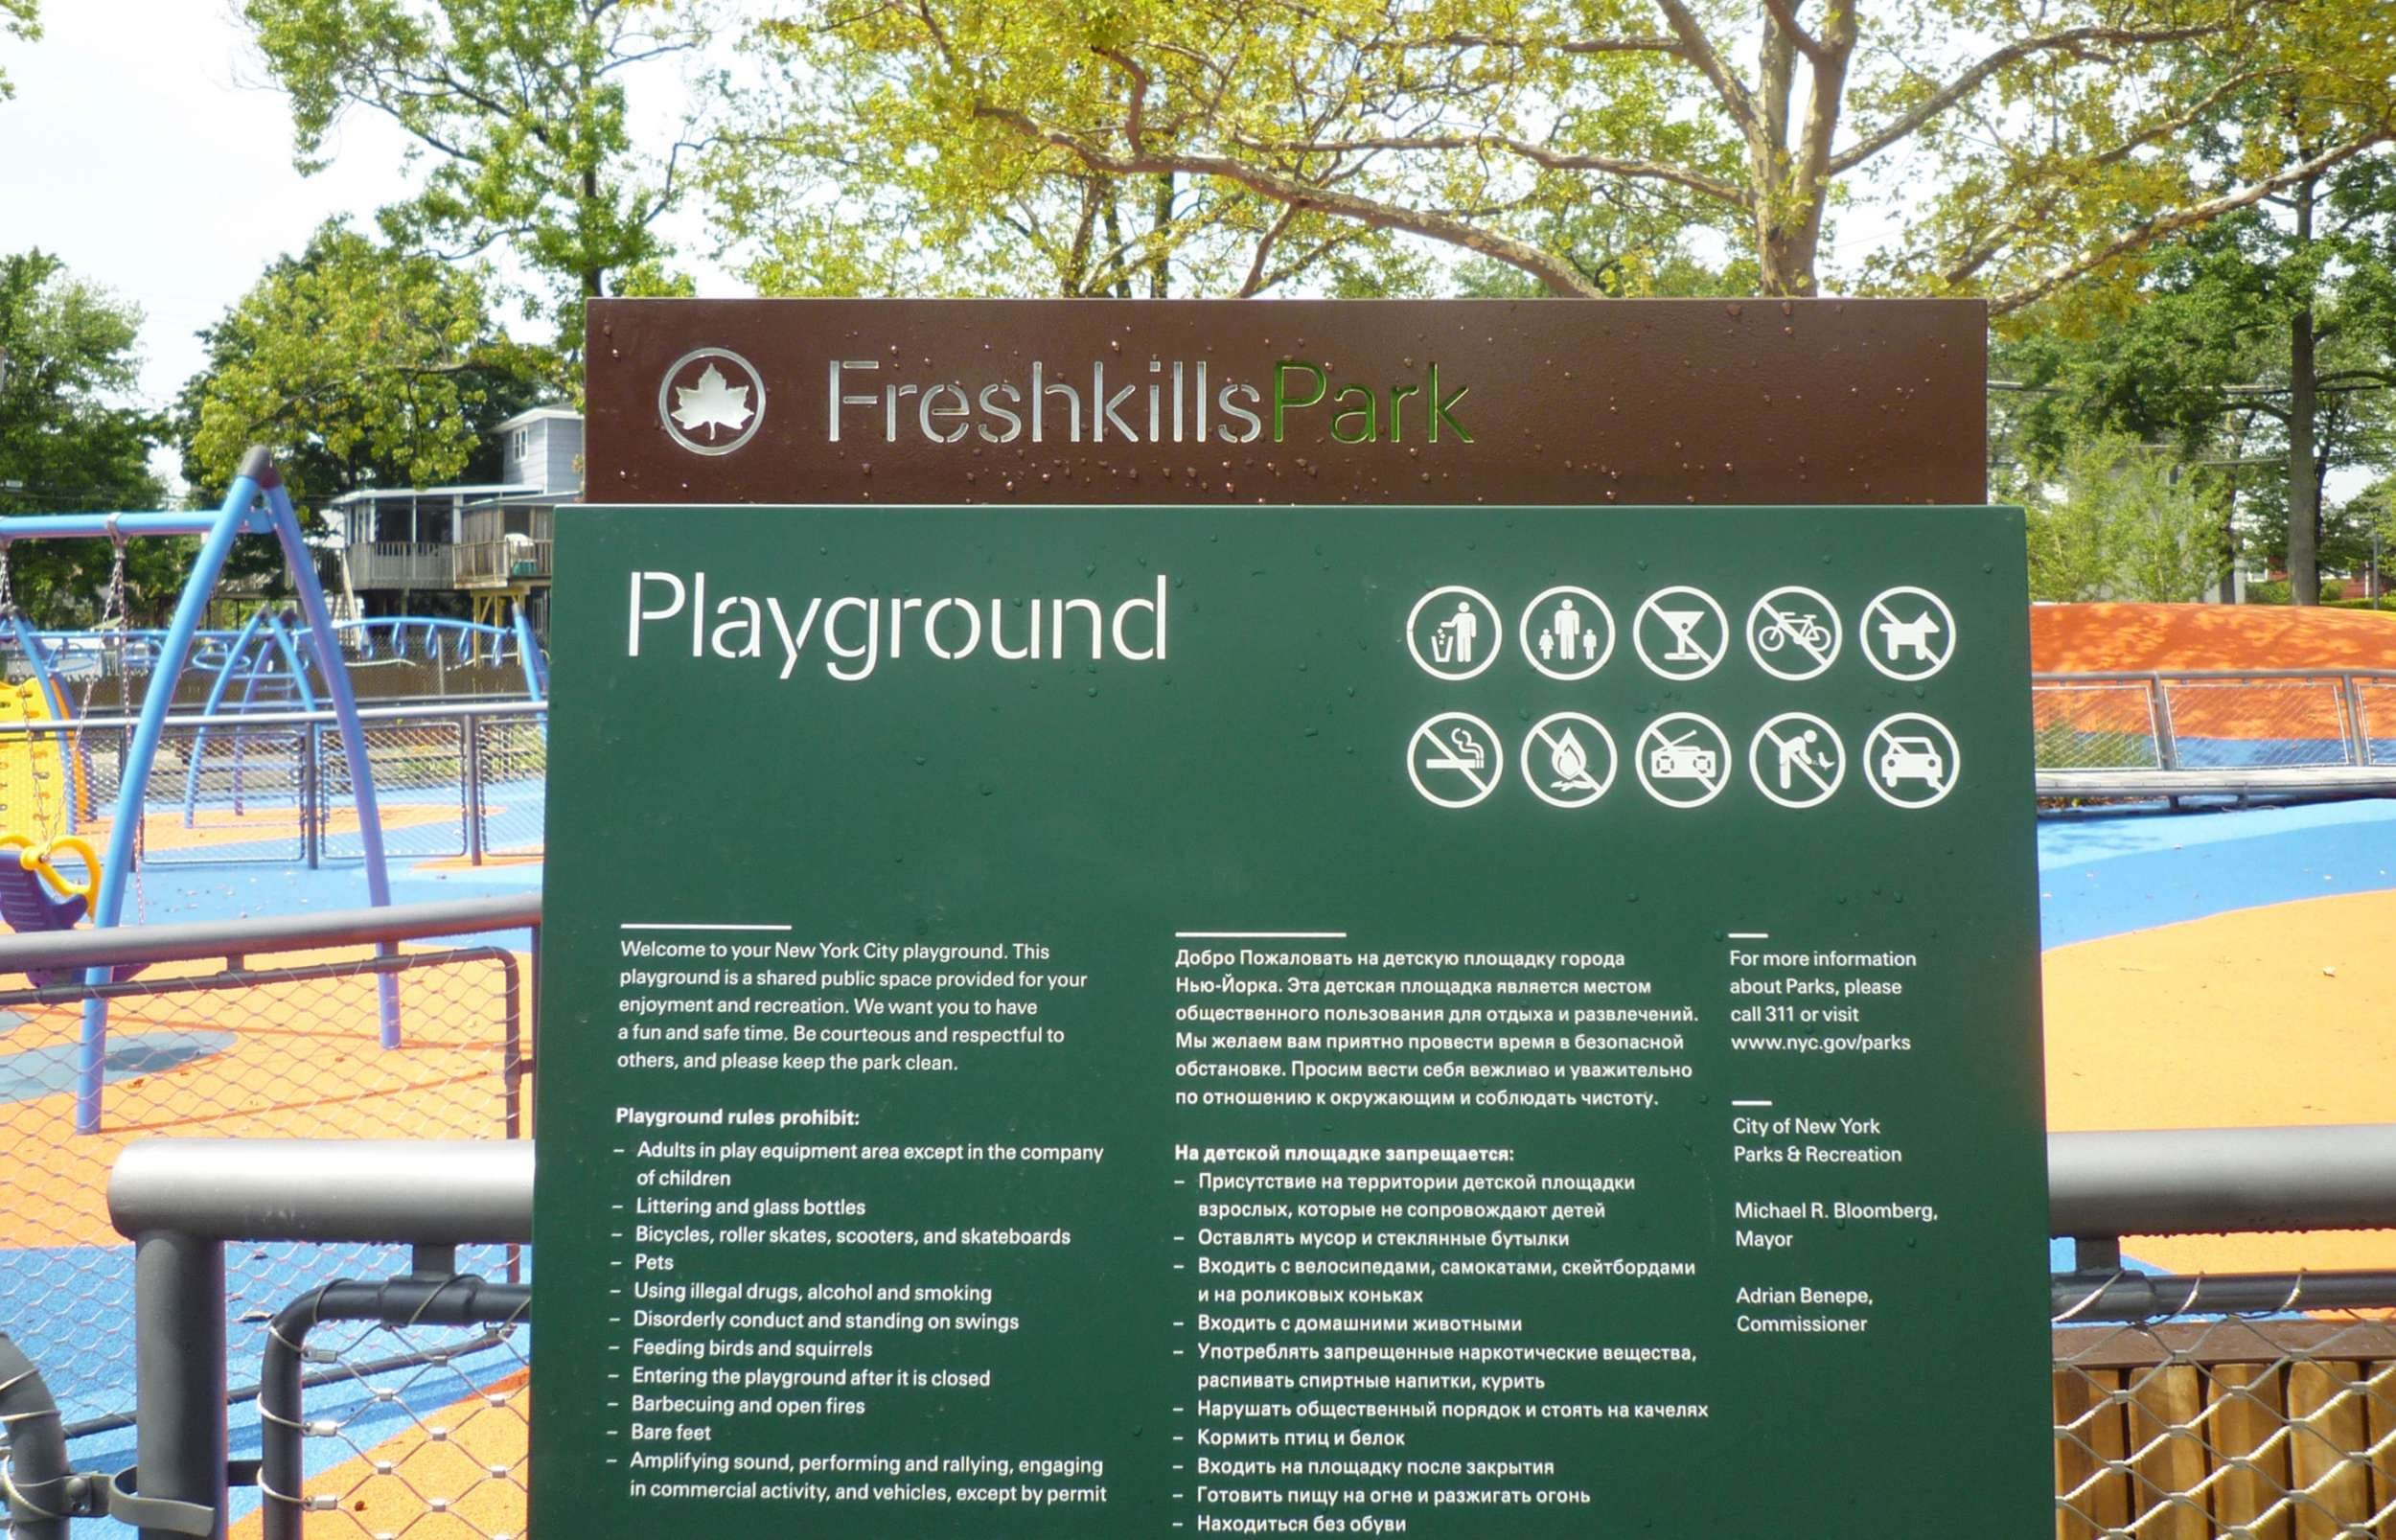 Freshkills Park